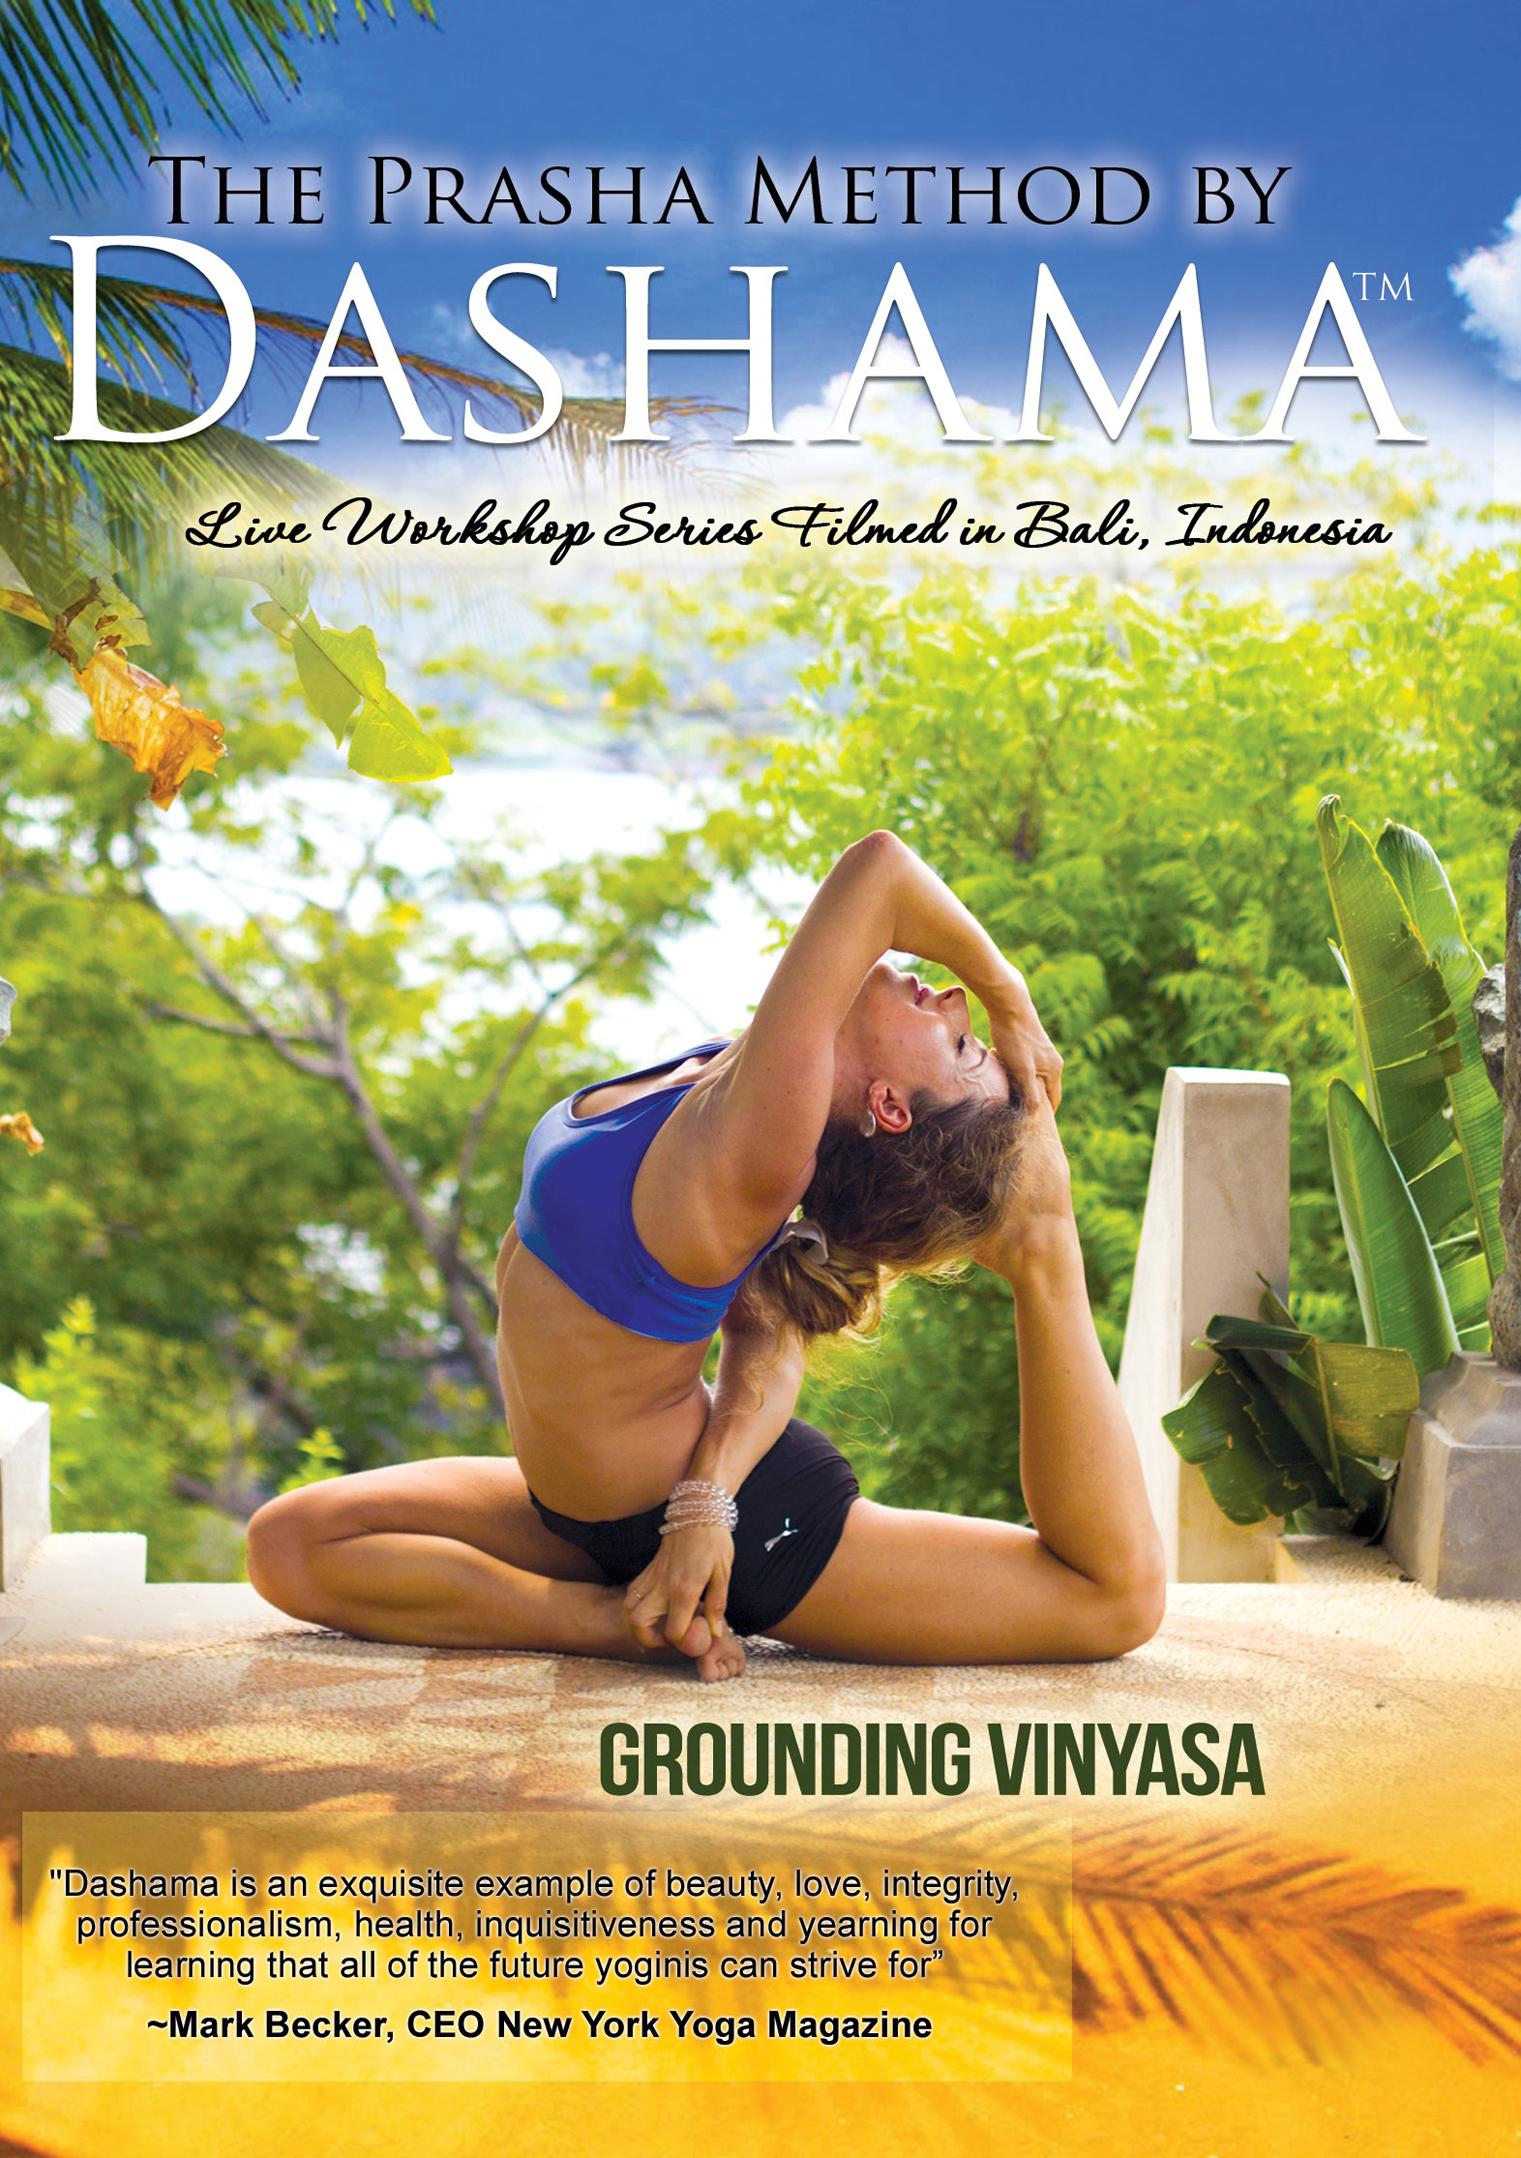 The Prasha Method by Dashama: Grounding Vinyasa